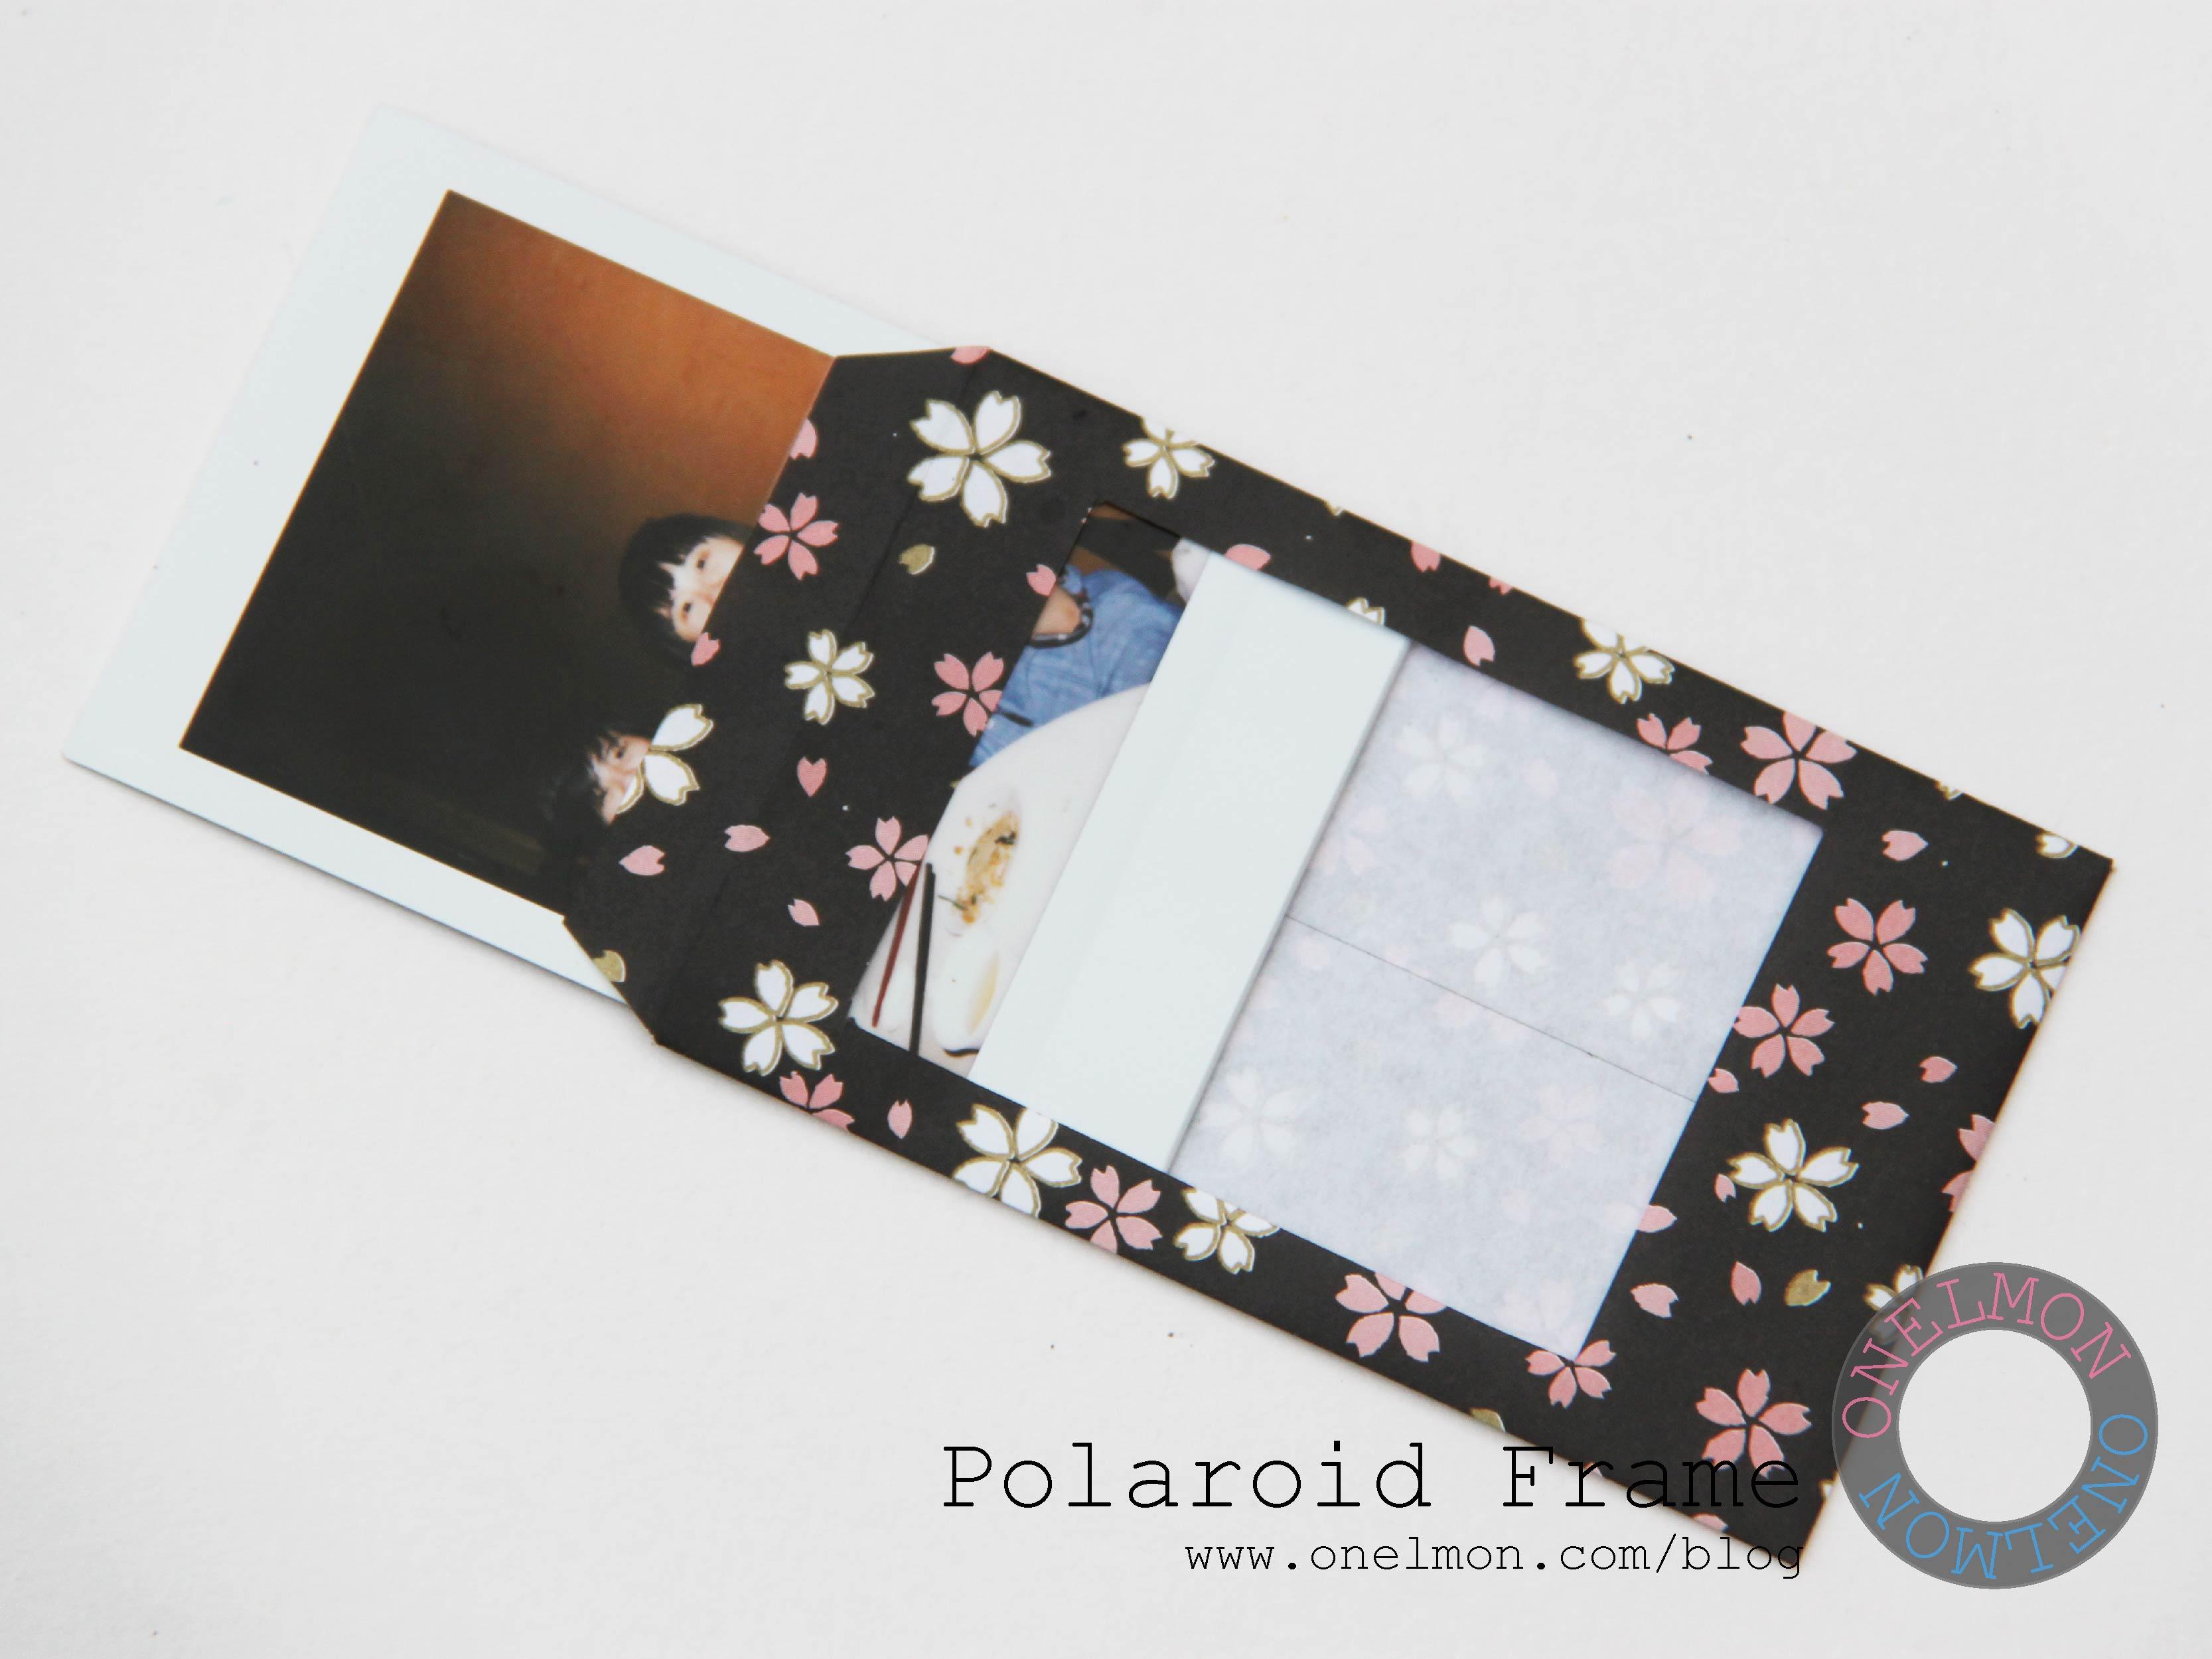 How To Make A Polaroid Frame Diy | Frameswalls.org